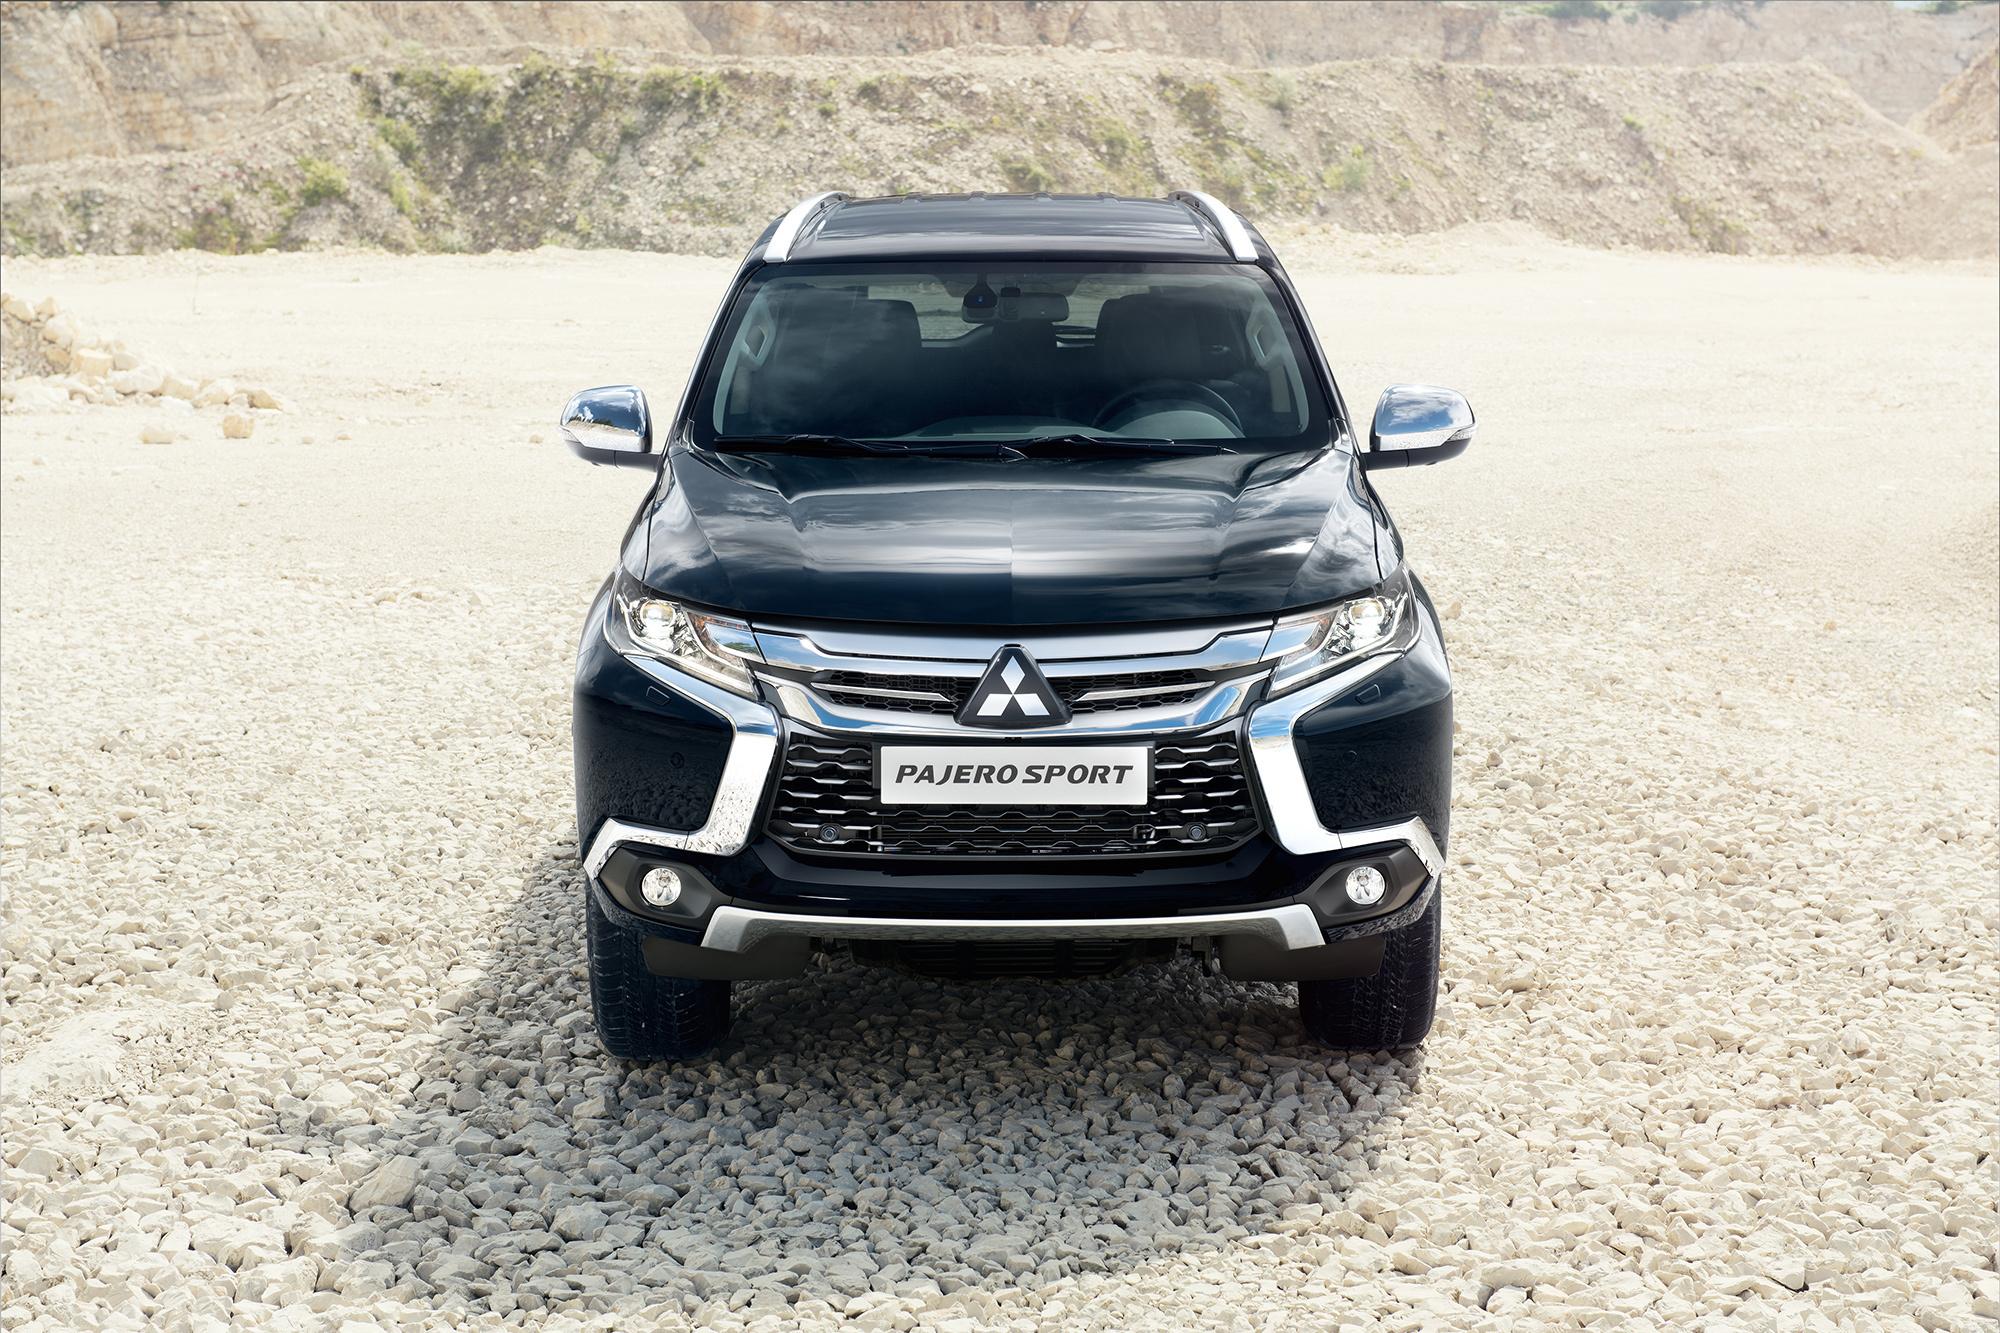 Mitsubishi Pajero Sport , HD Wallpaper & Backgrounds